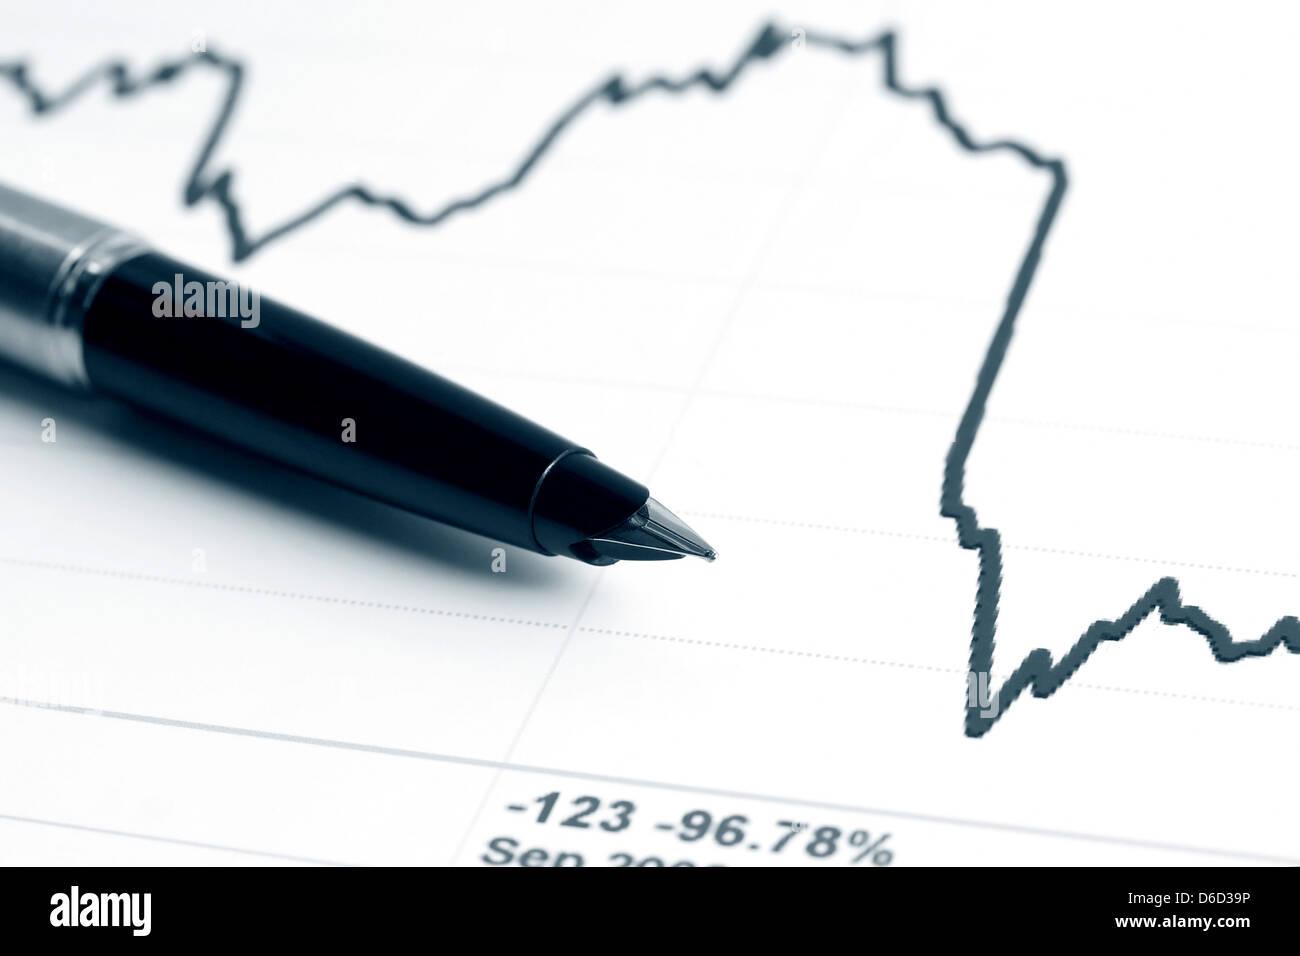 Stock index dynamics - Stock Image